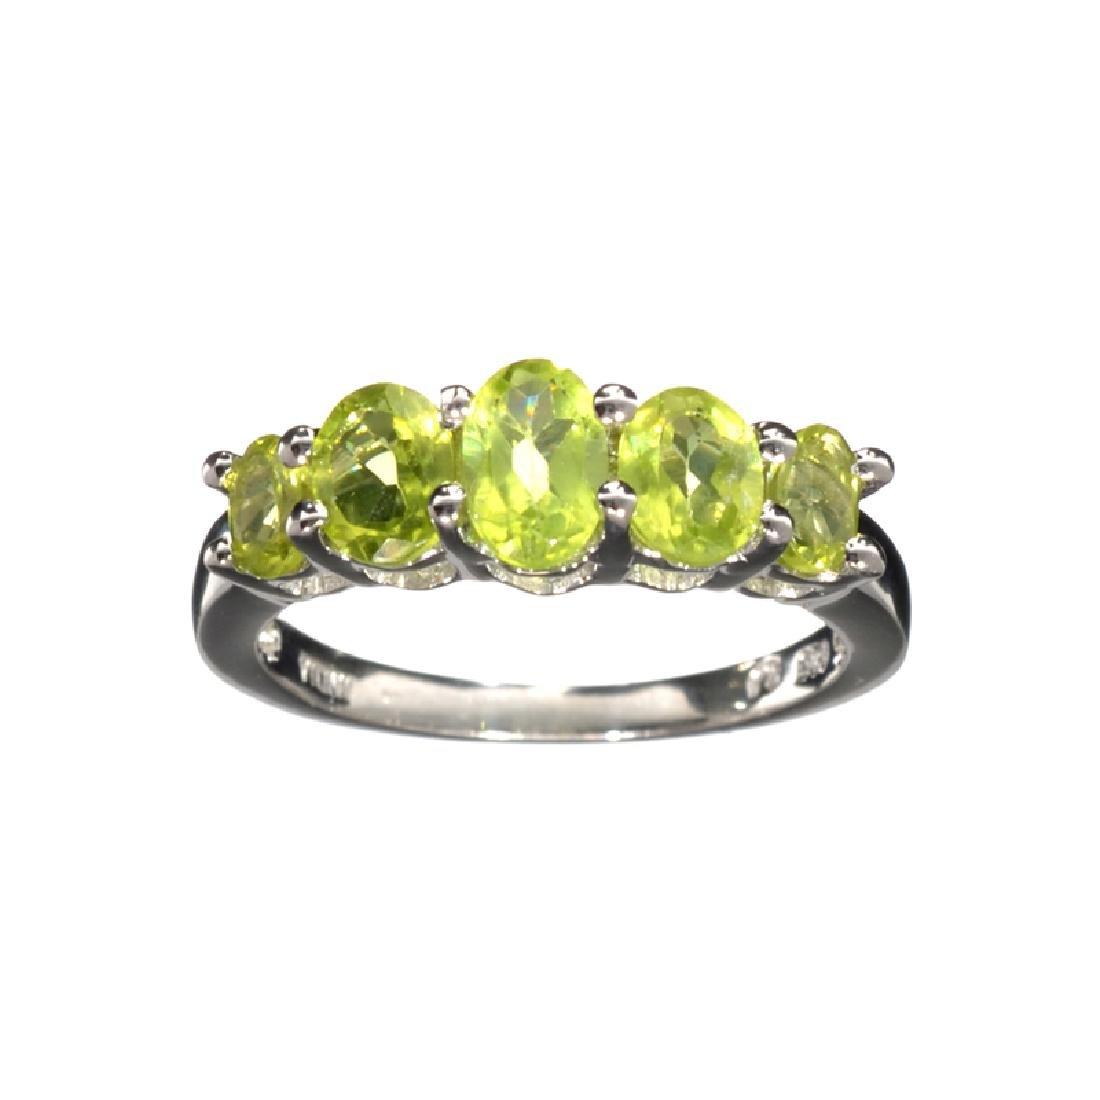 APP: 0.3k Fine Jewelry 1.49CT Oval Cut Green Peridot